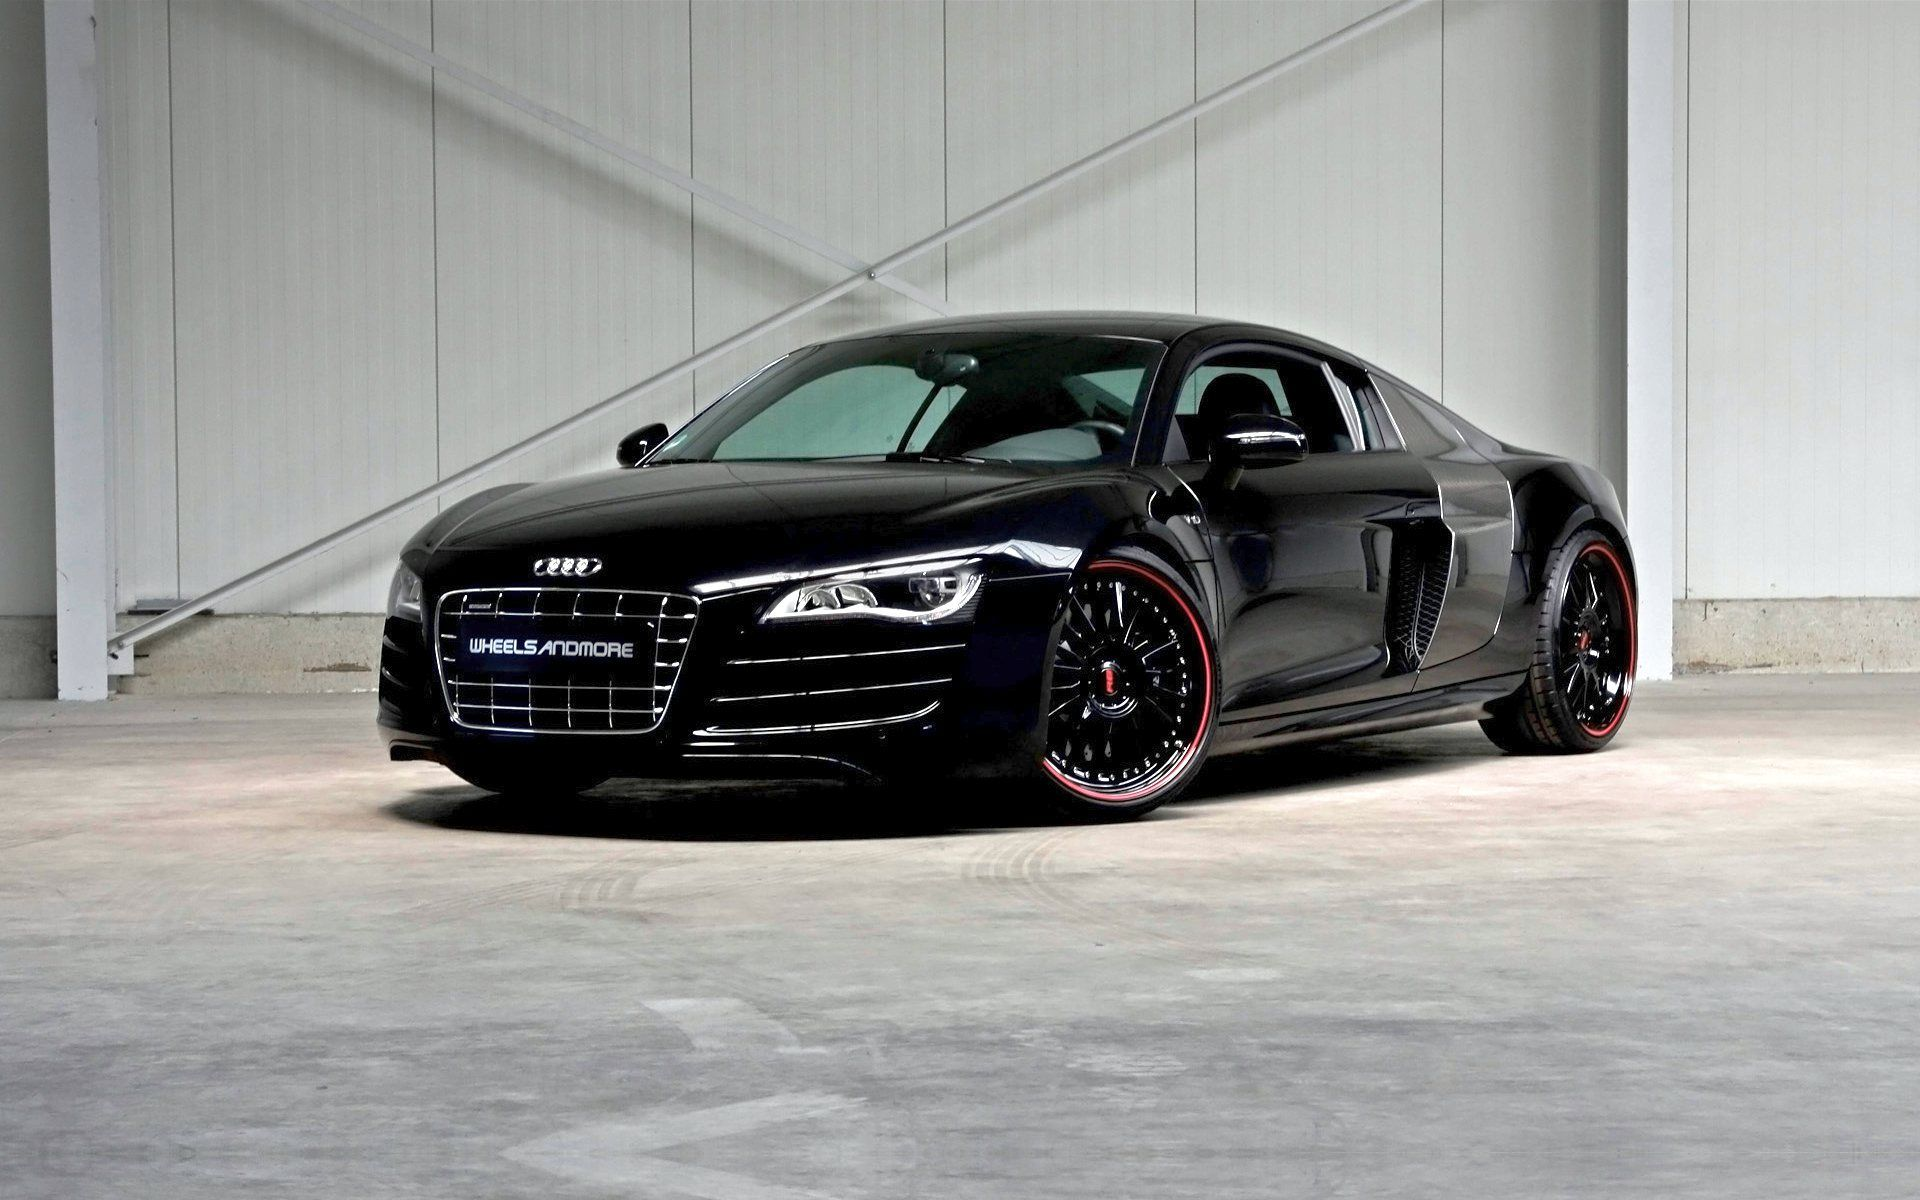 Dark Black Sporty Audi R8 Wallpaper Resolution Audi R8 2015 Black 2177435 Hd Wallpaper Backgrounds Download